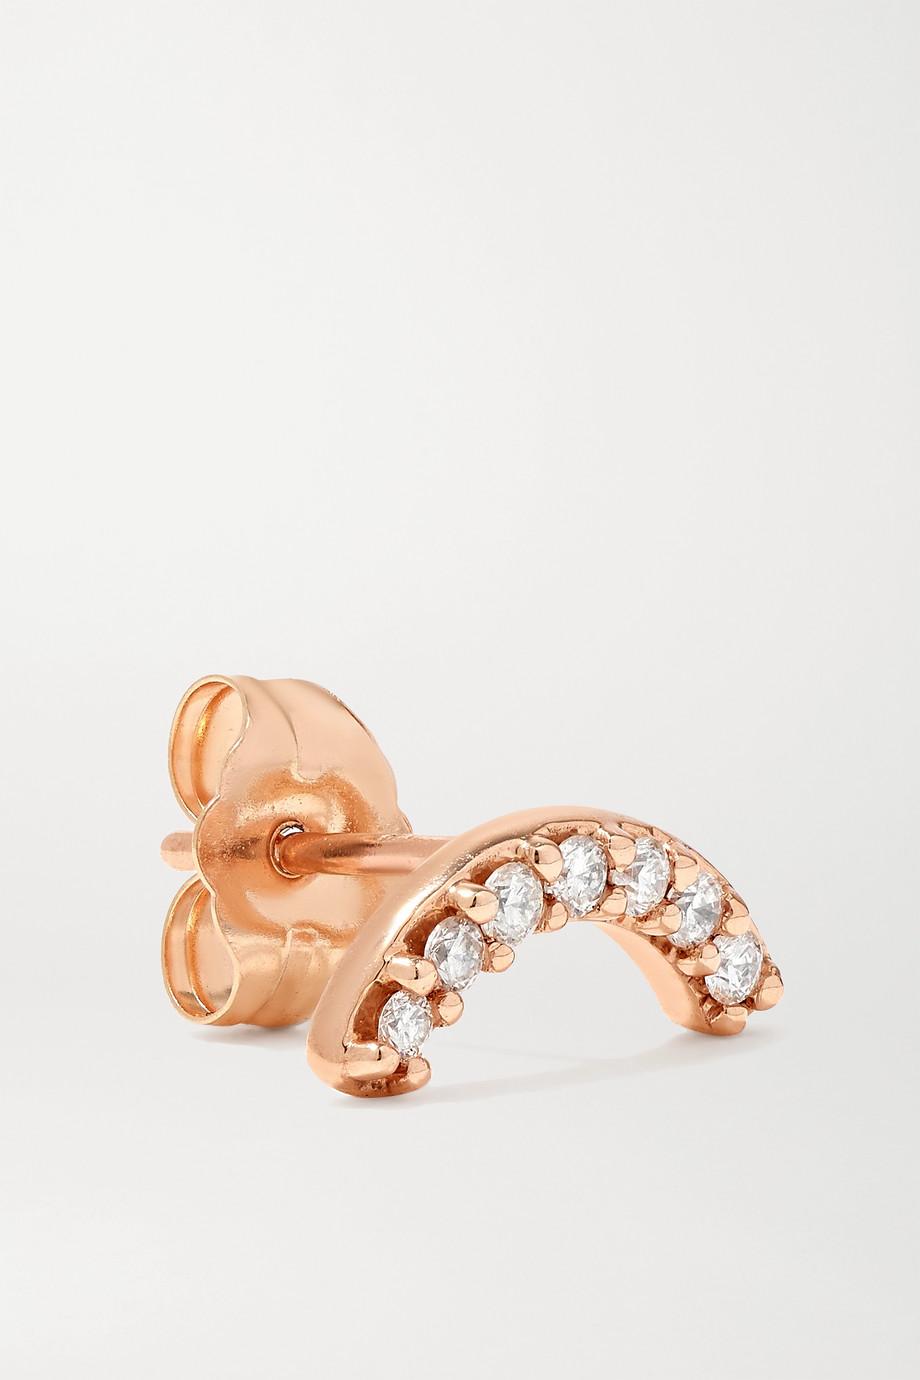 Andrea Fohrman 14K 玫瑰金钻石单只耳钉